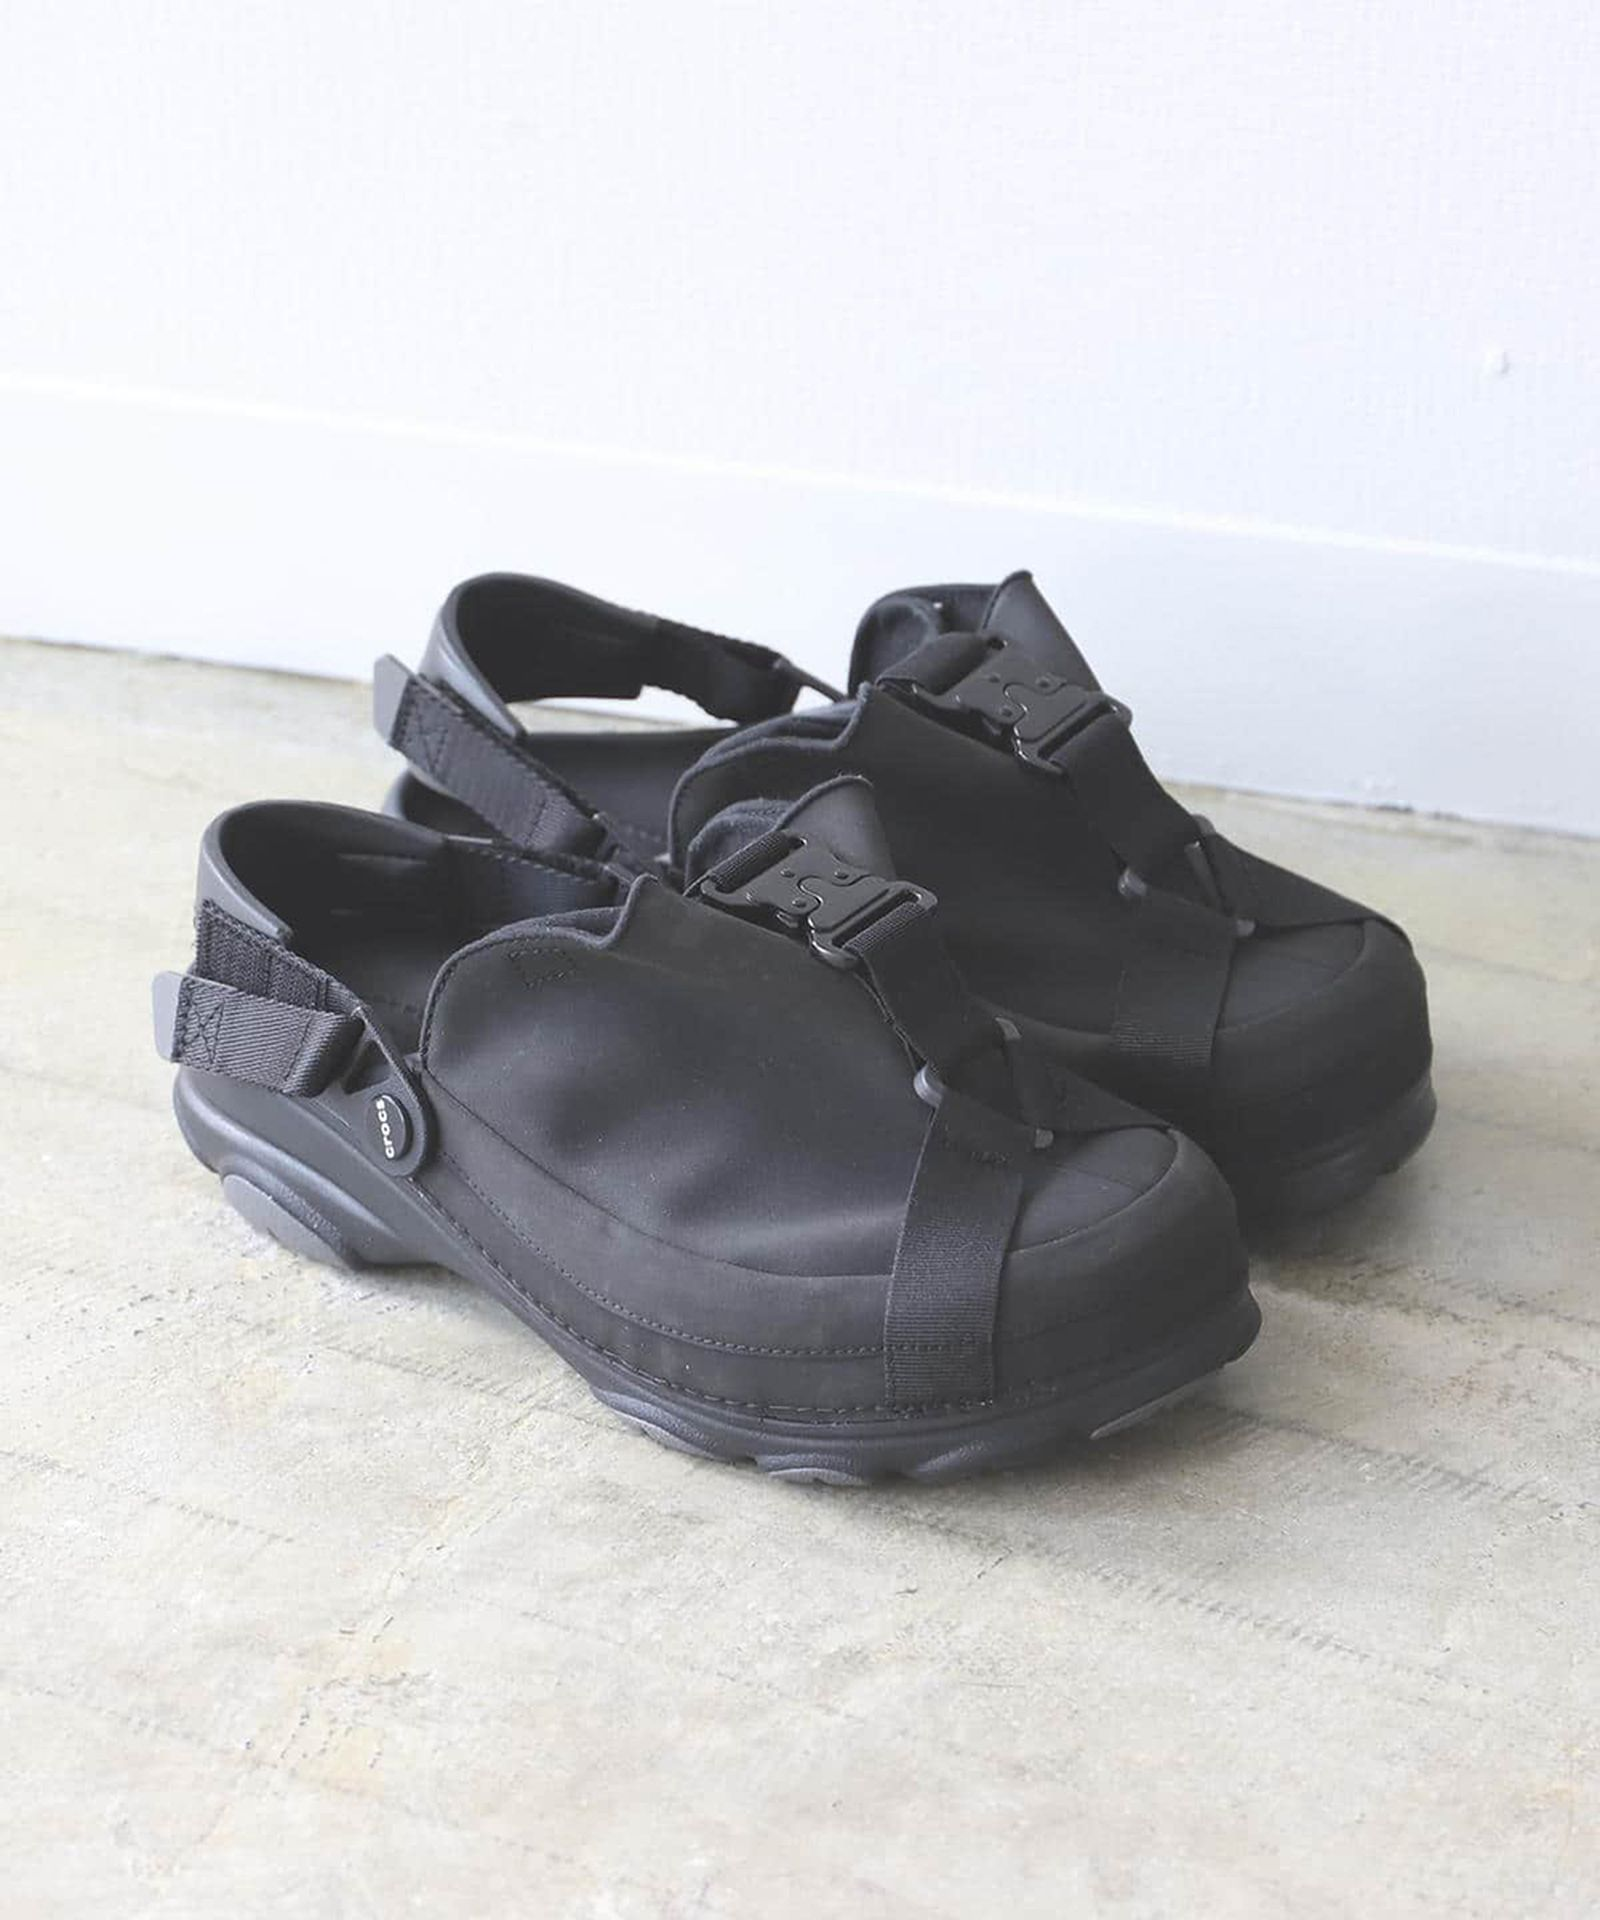 BEAMS x Crocs SS20